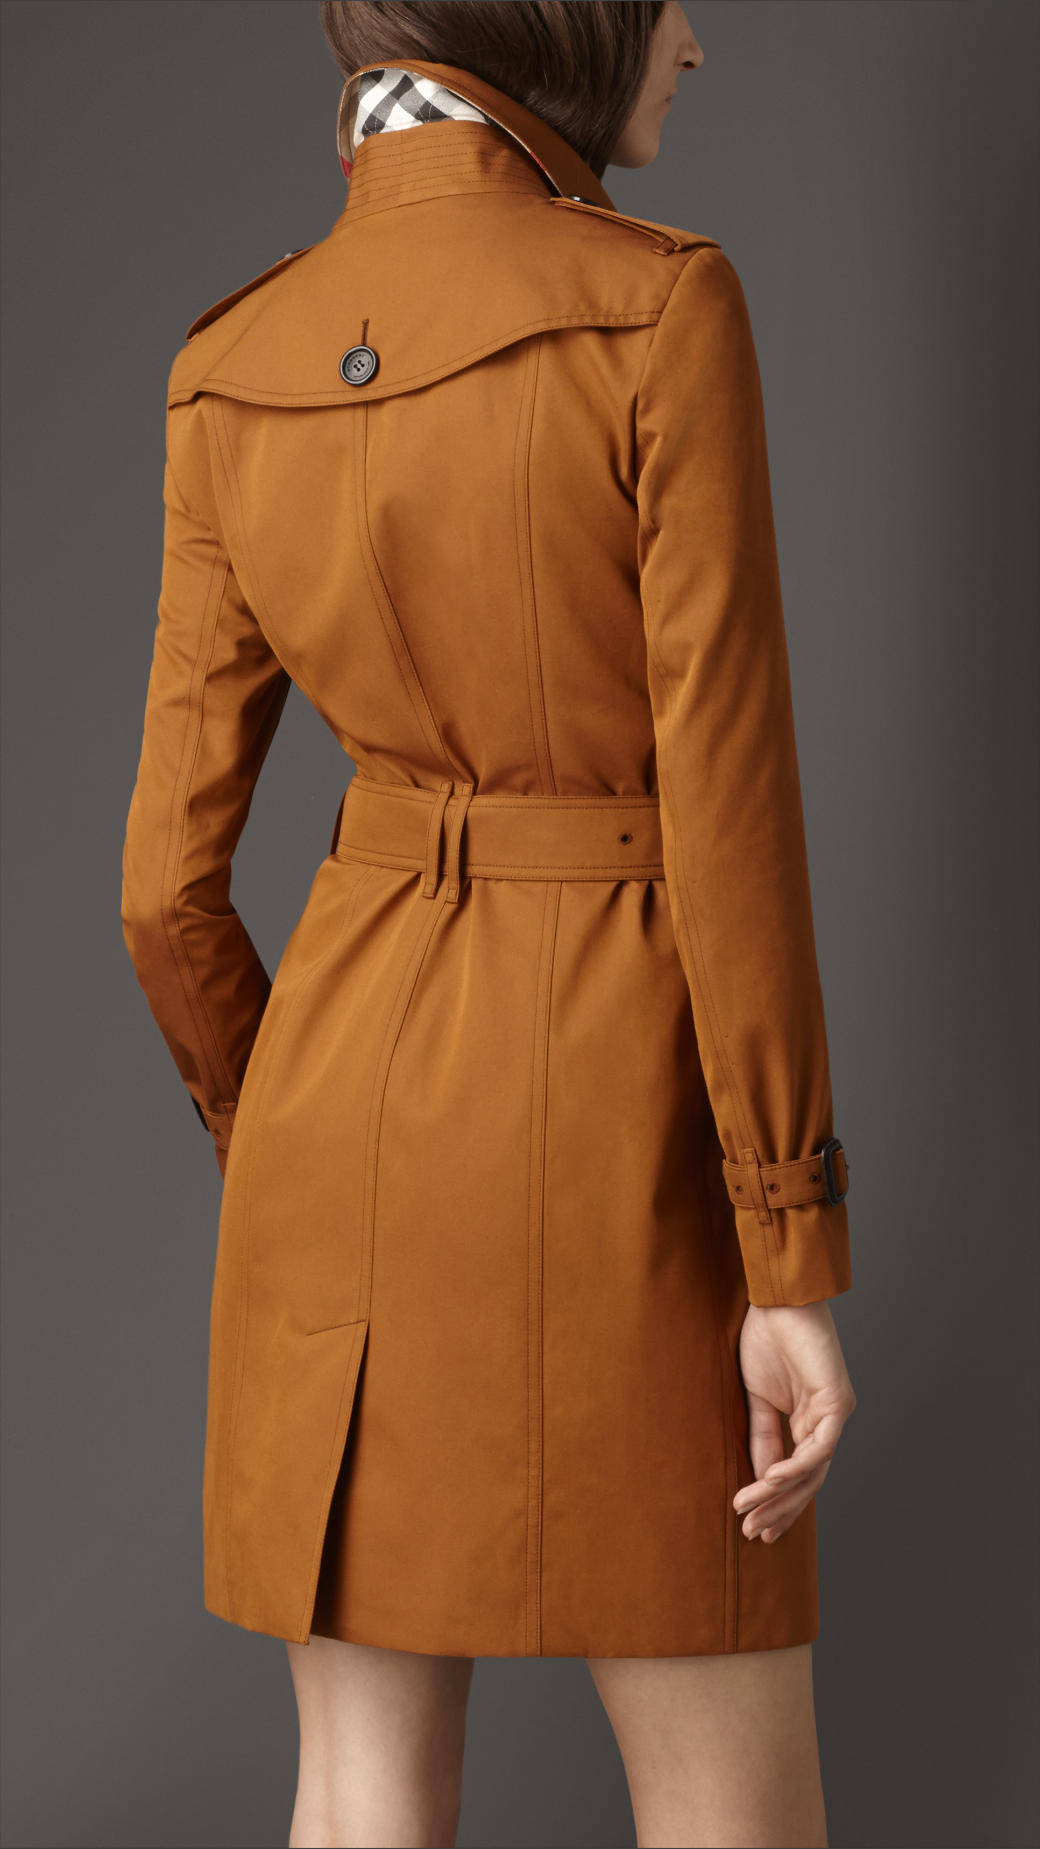 Burberry Long Slim Fit Gabardine Trench Coat in Brown | Lyst